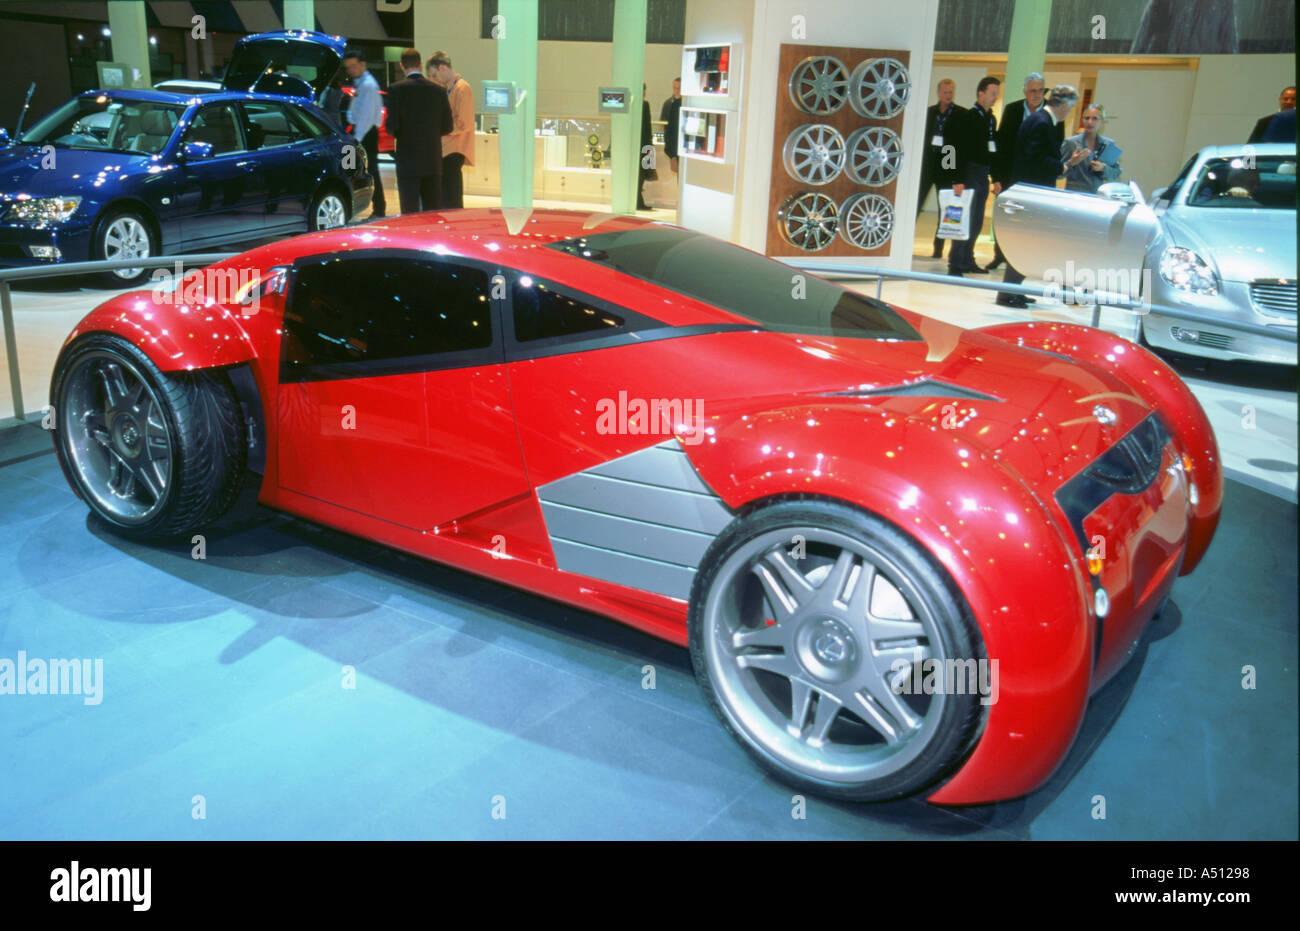 2002 Lexus Elektro-Konzeptfahrzeug verwendet im Film Minority Report Stockbild